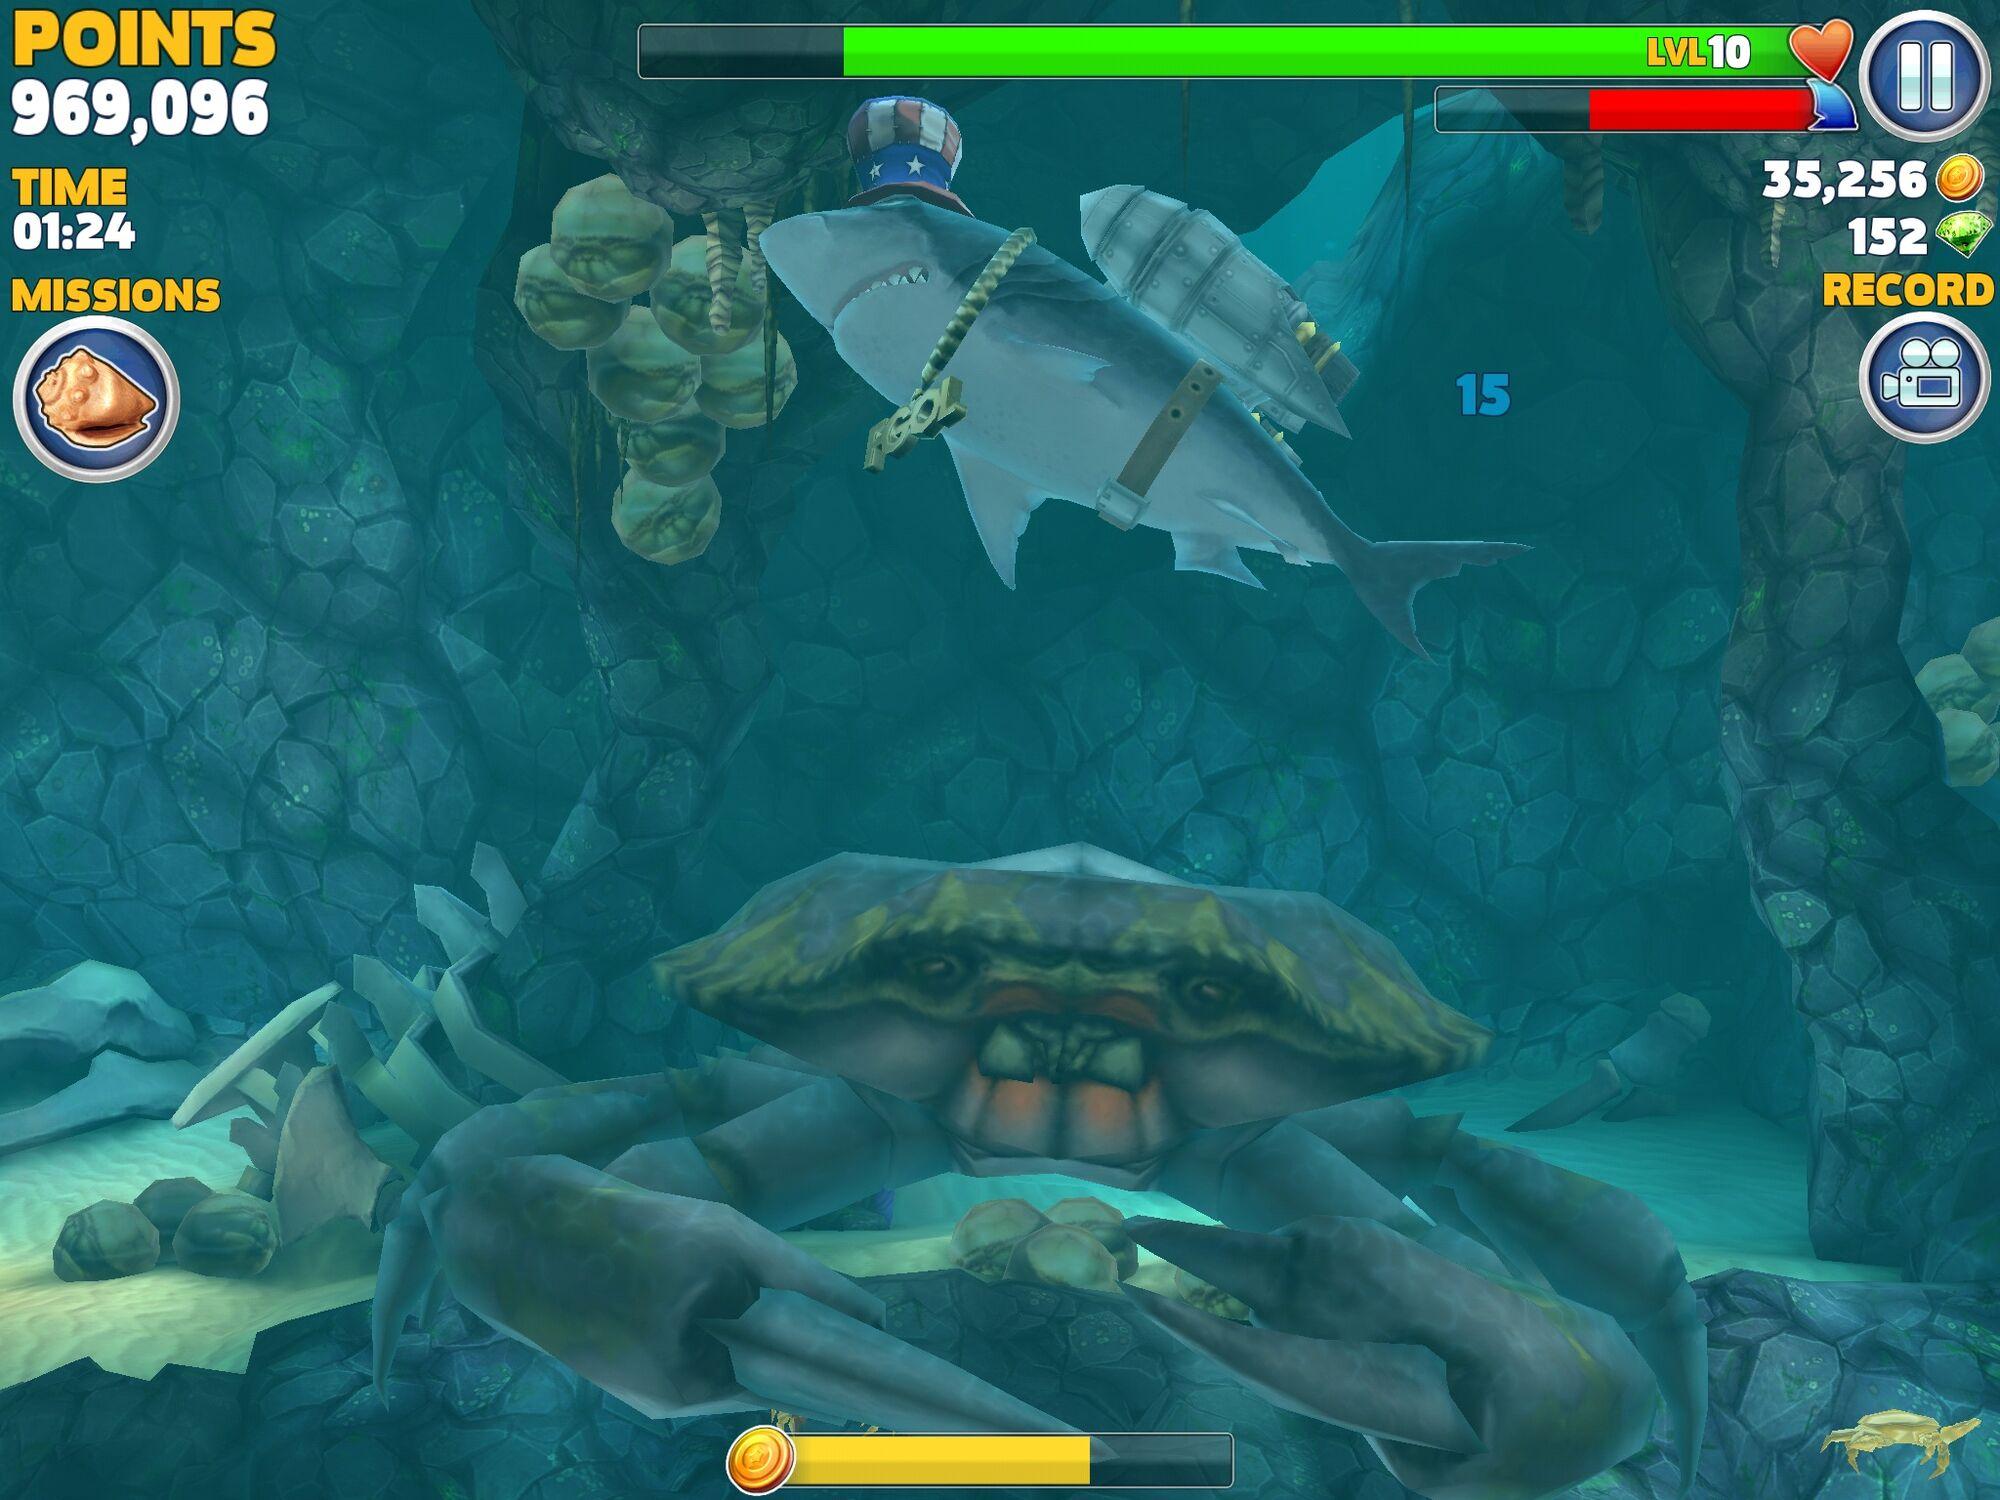 Hungry shark evolution megalodon vs giant crab - photo#43